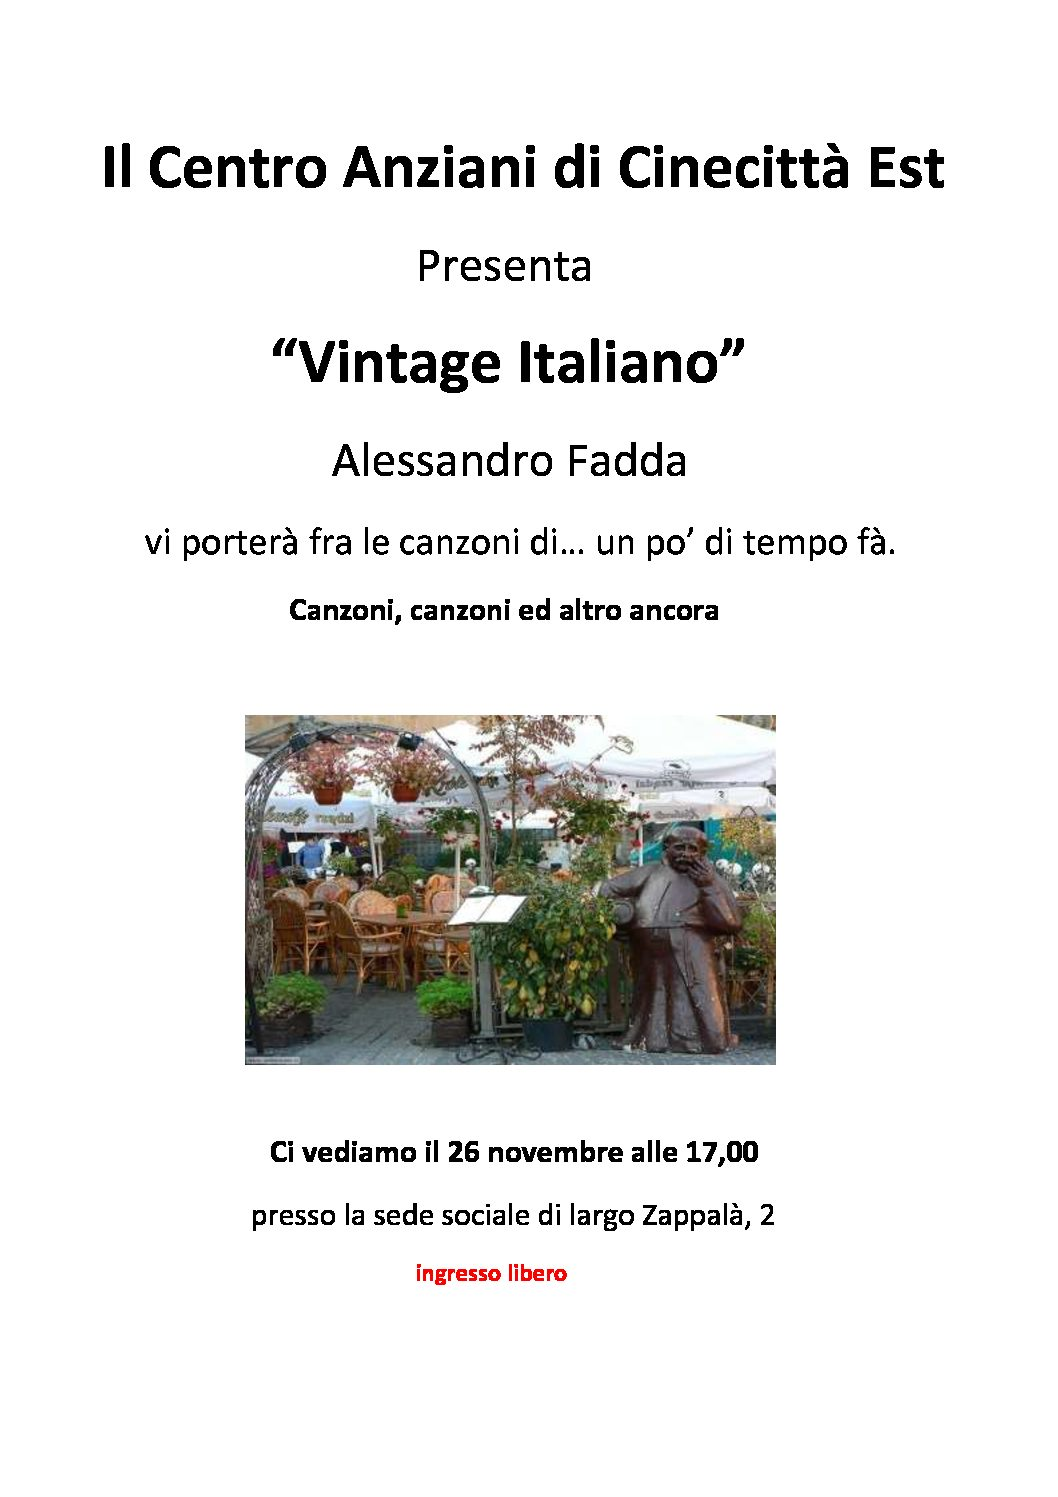 Vintage Italiano